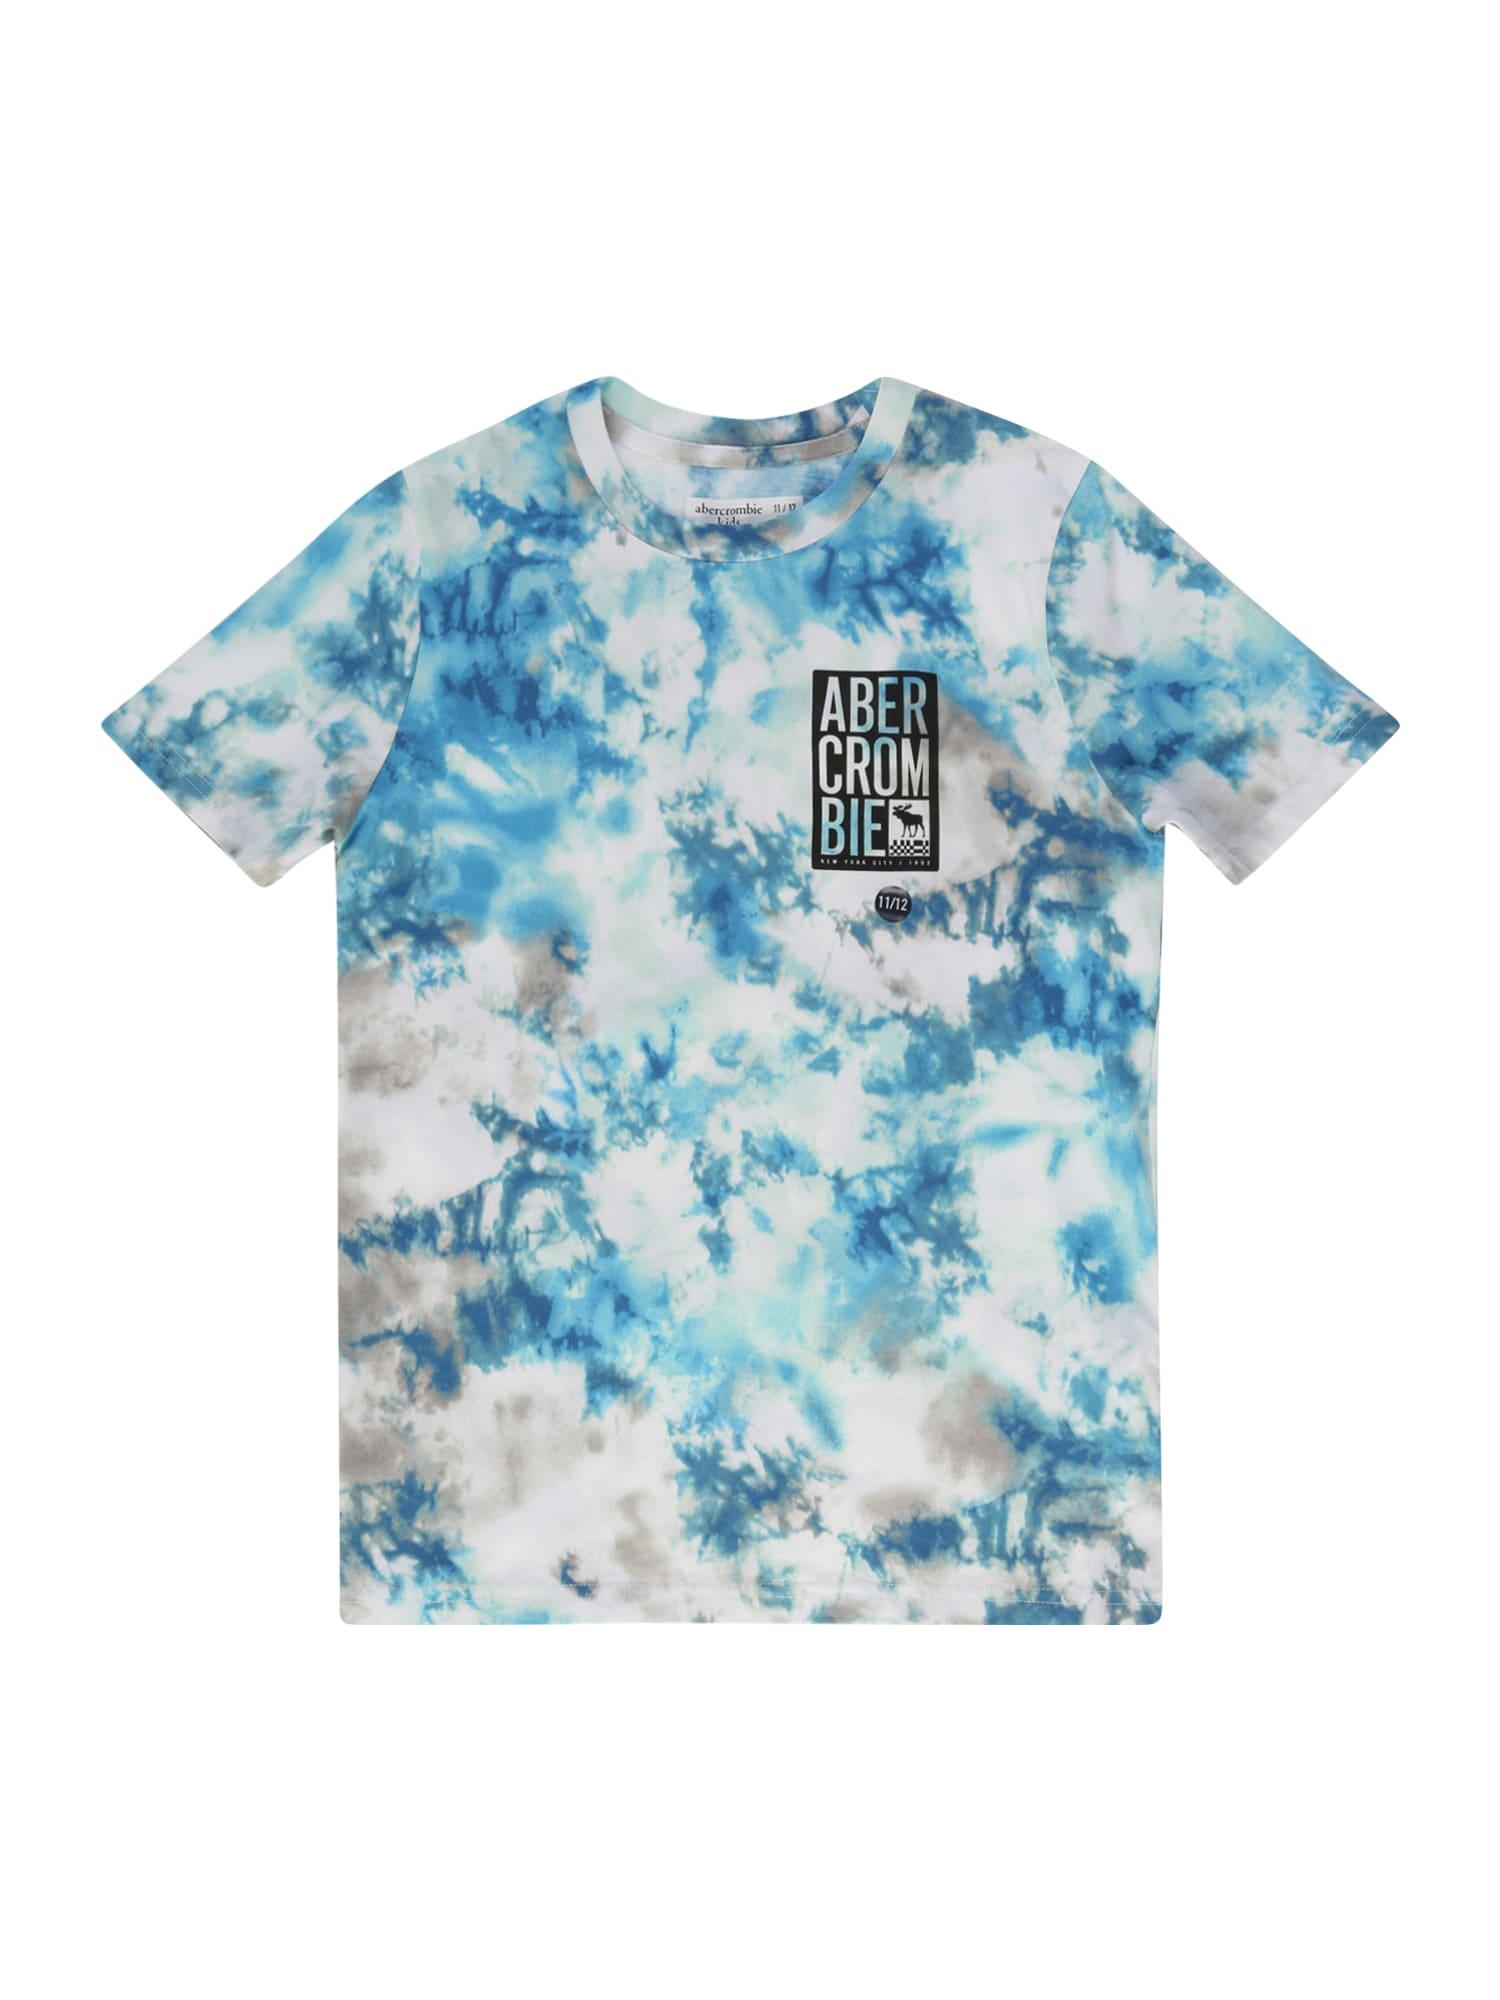 Abercrombie & Fitch Marškinėliai mėlyna / balta / juoda / dangaus žydra